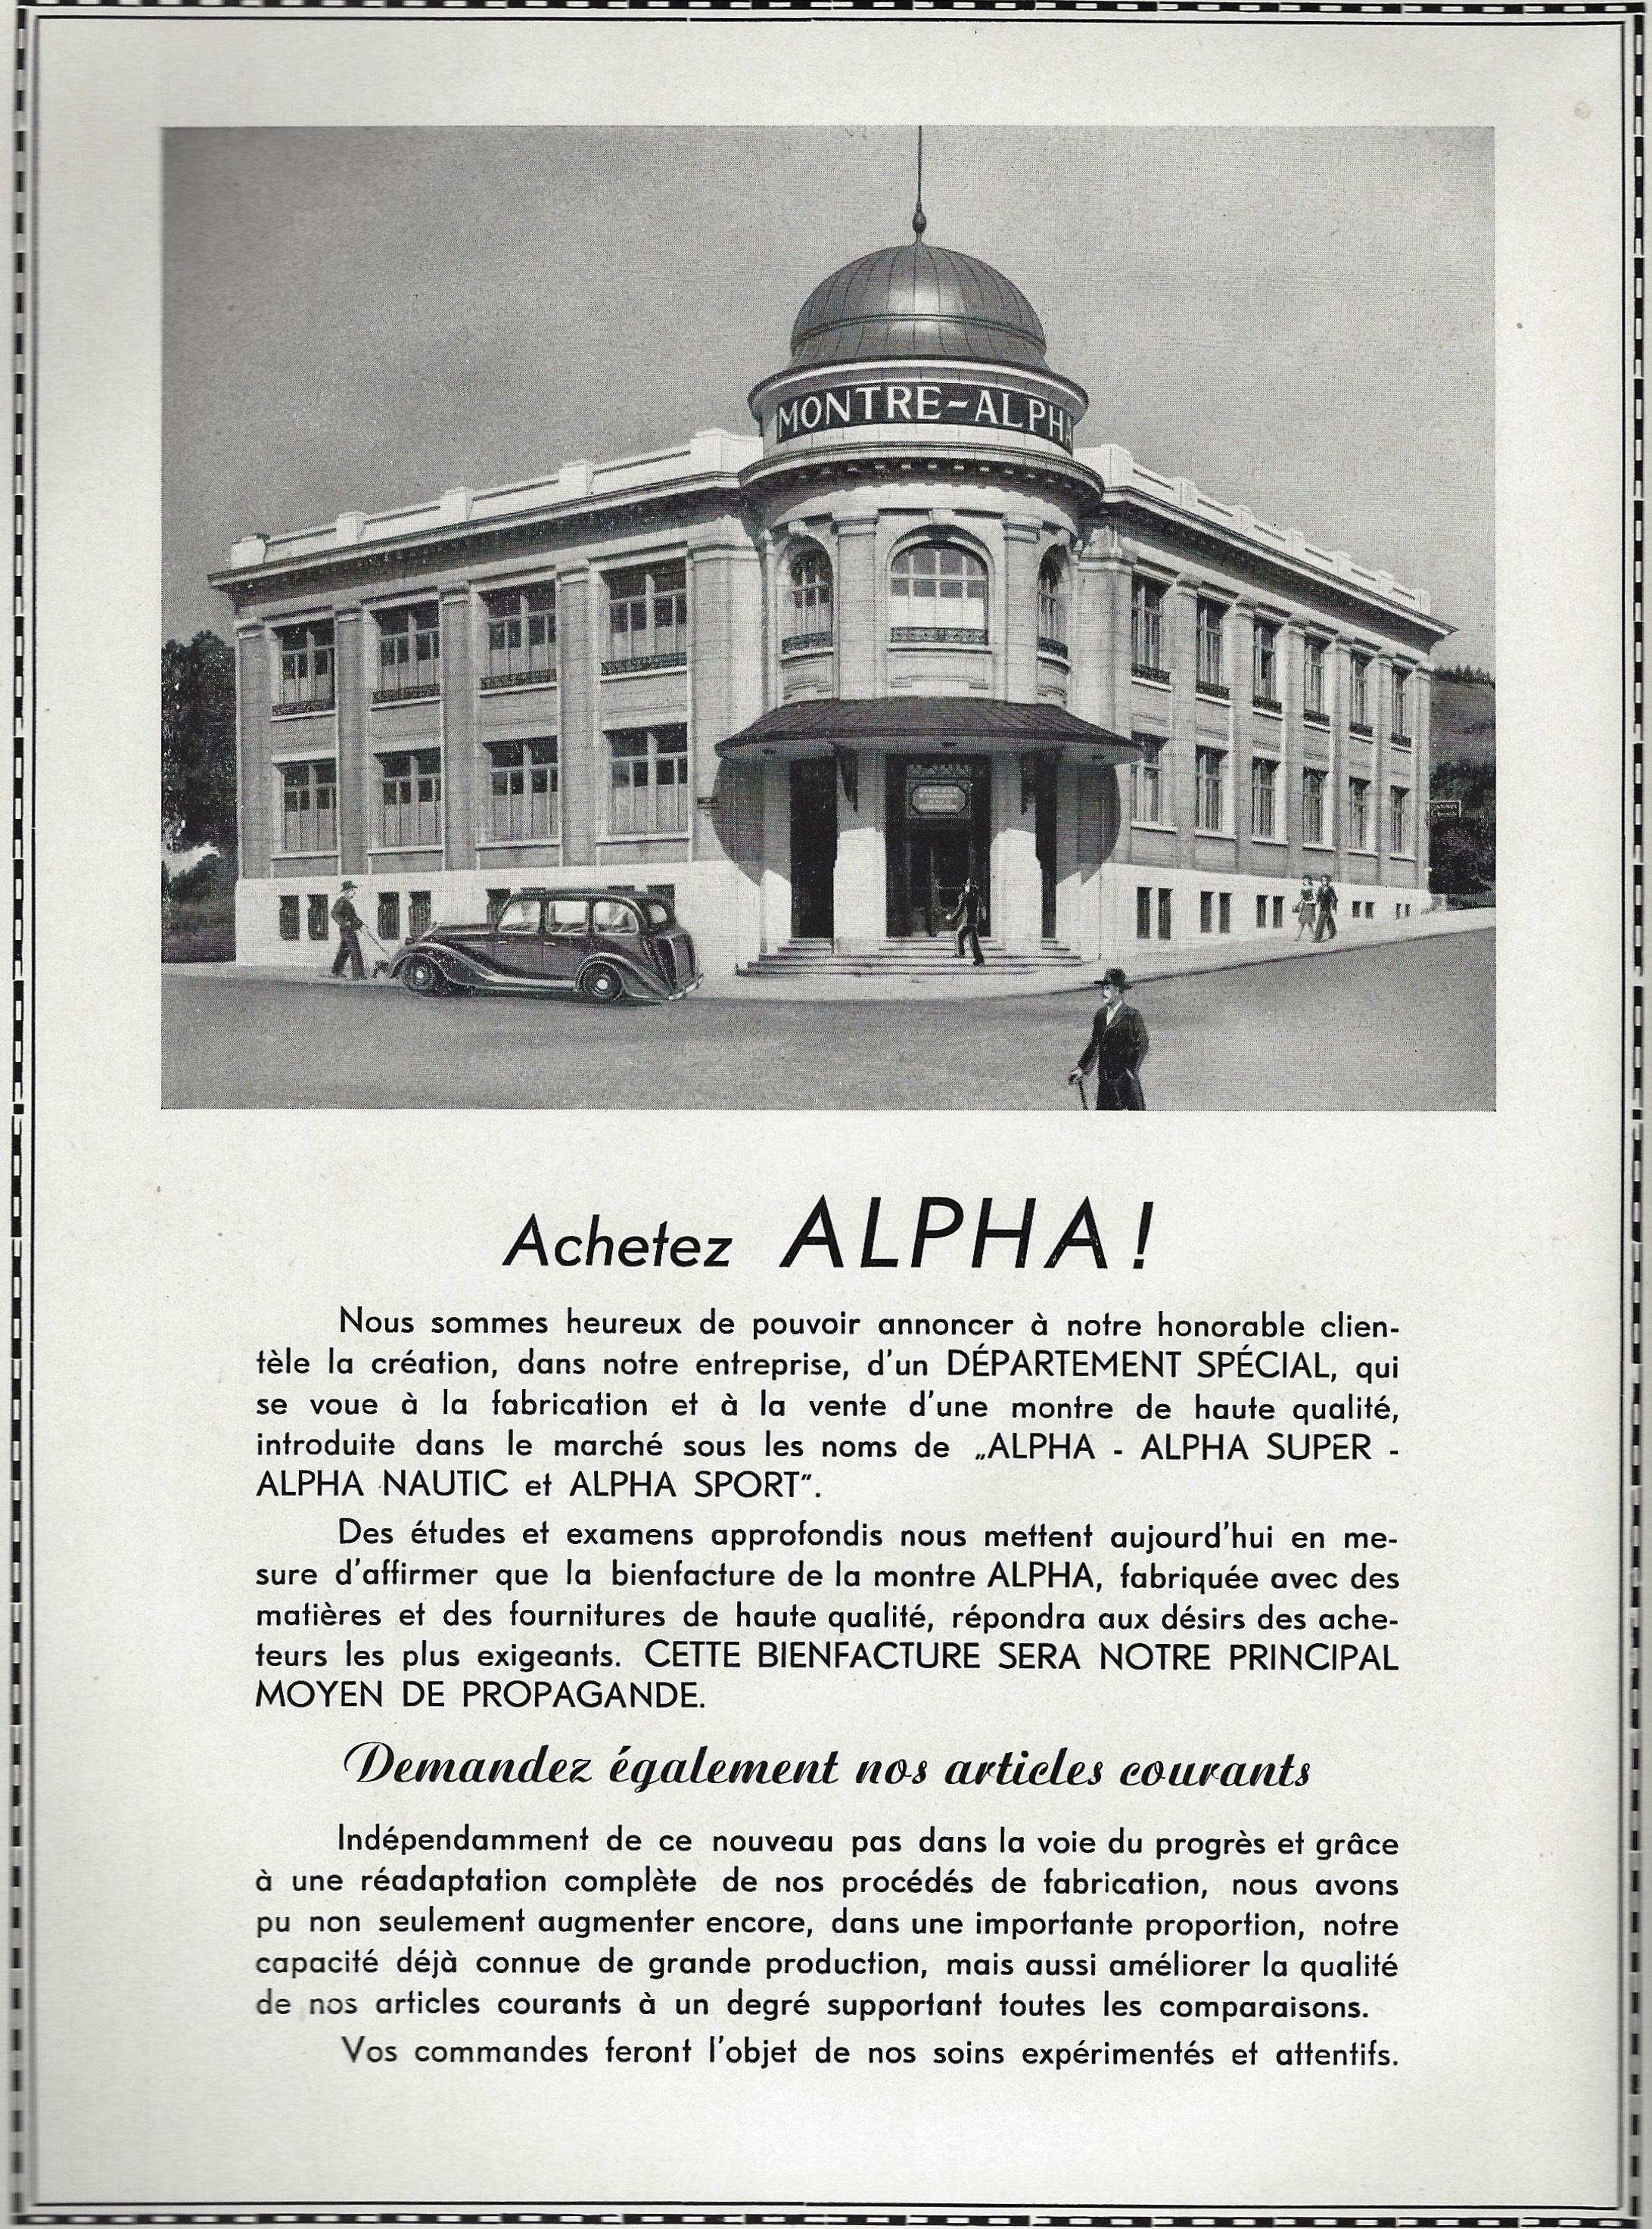 1949 Alpha_montres_1949